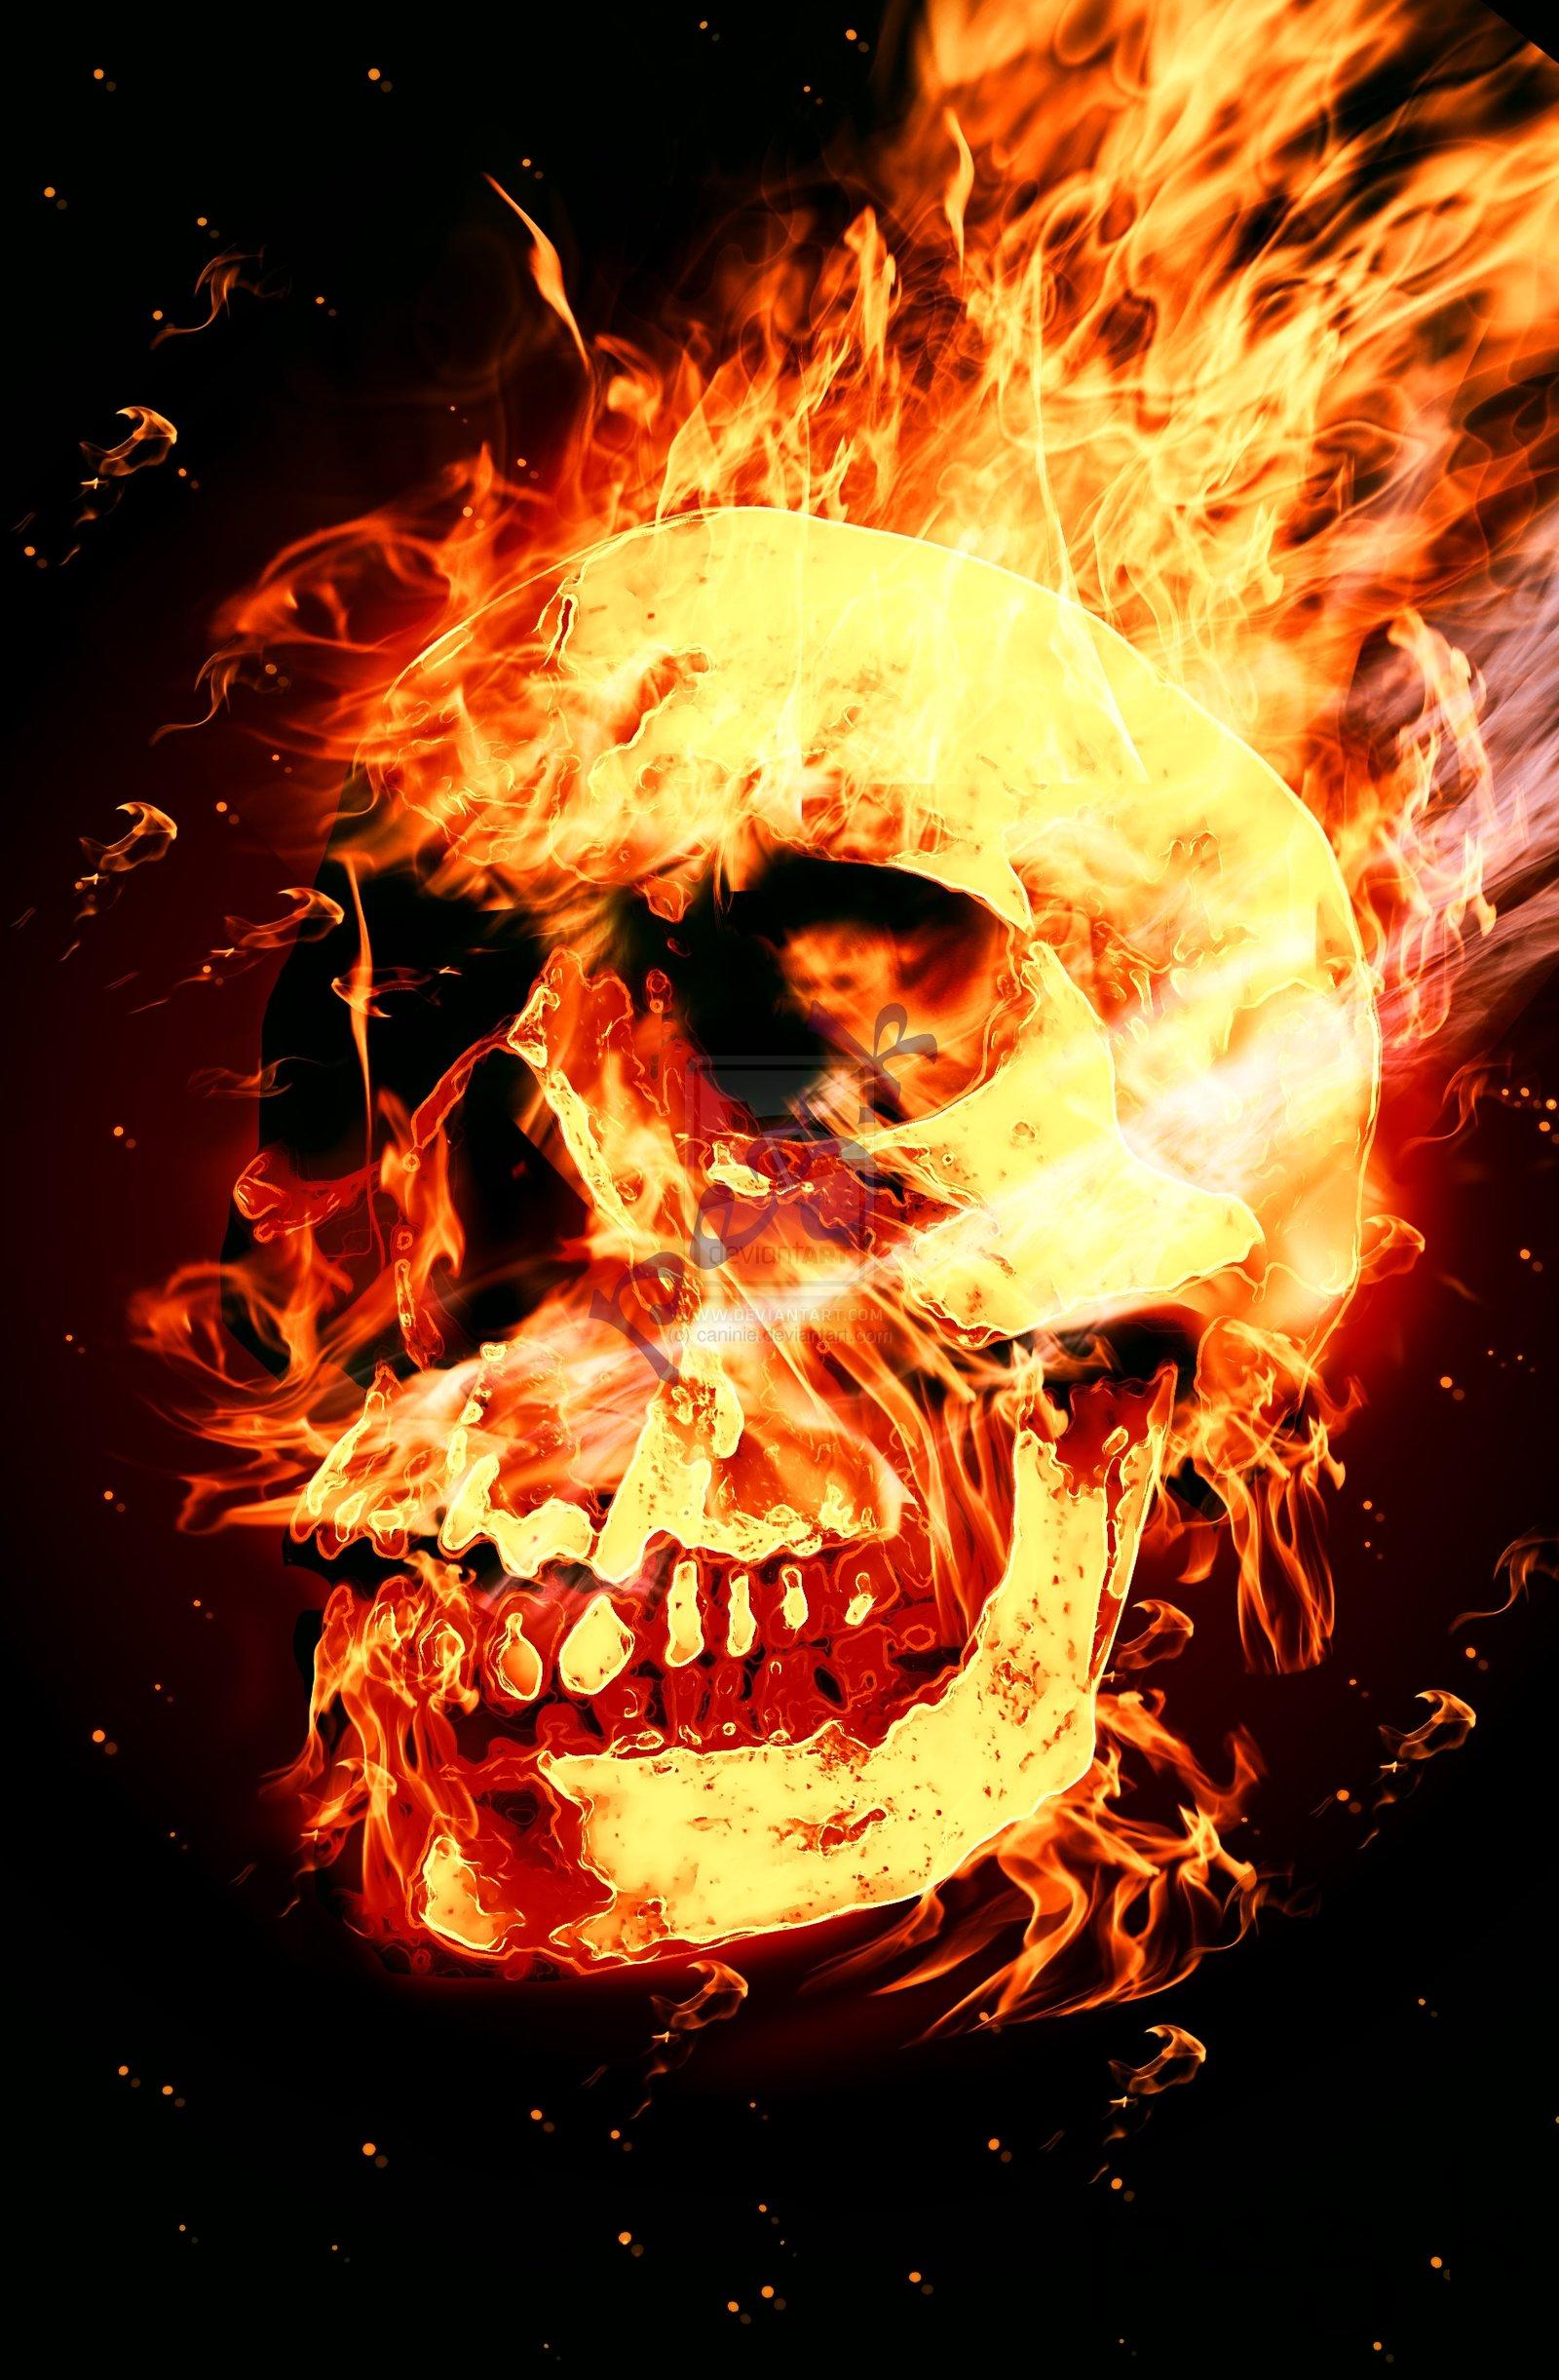 Fire Skull Pics wallpaper Fire Skull Pics hd wallpaper background 1600x2442